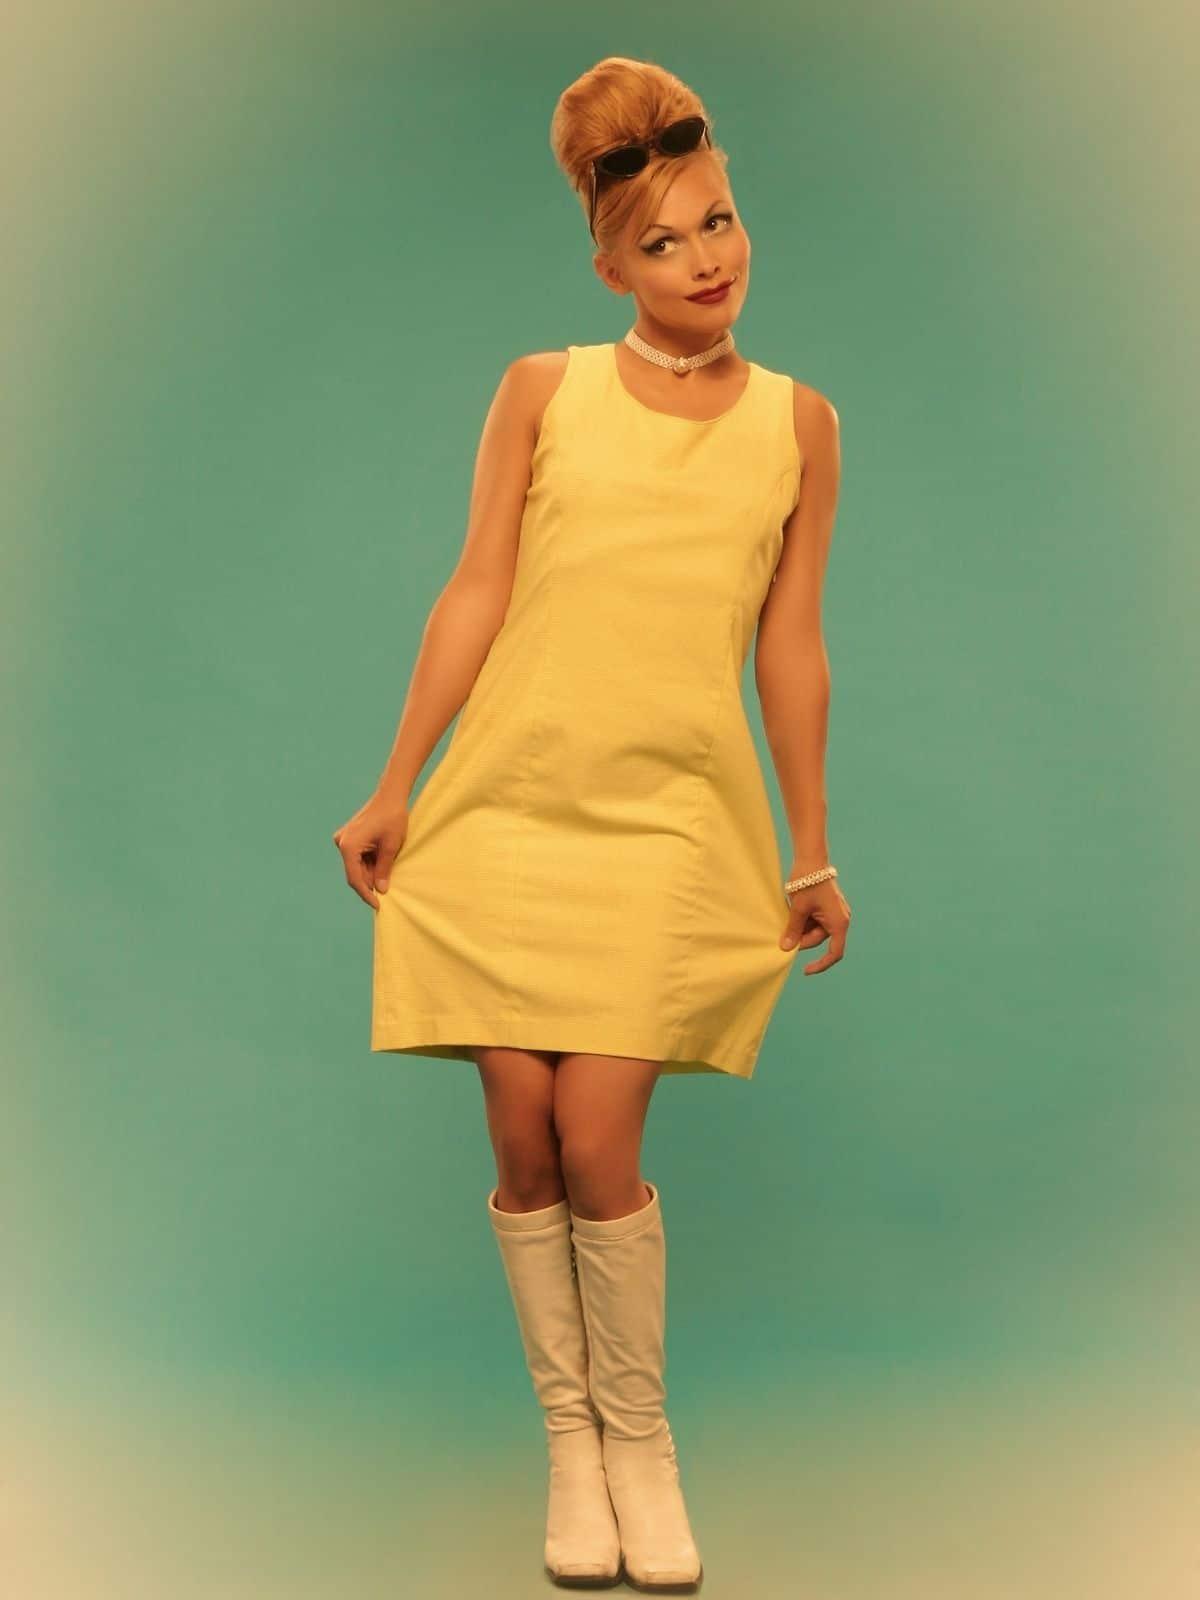 60s party themes retro girl